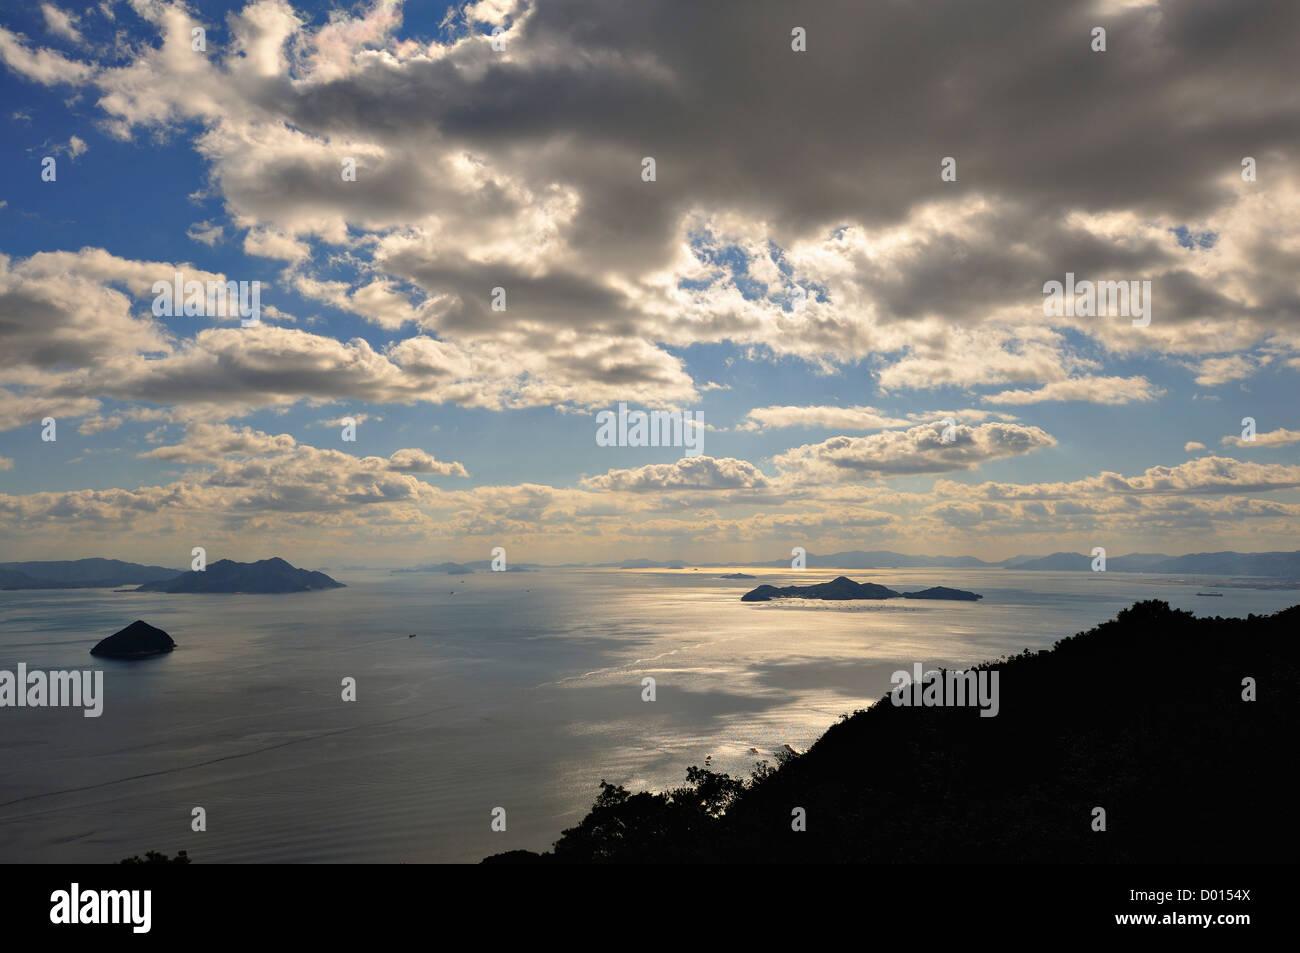 Seto Inland Sea from the summit of Mt Misen on the island of Miyajima, Japan - Stock Image